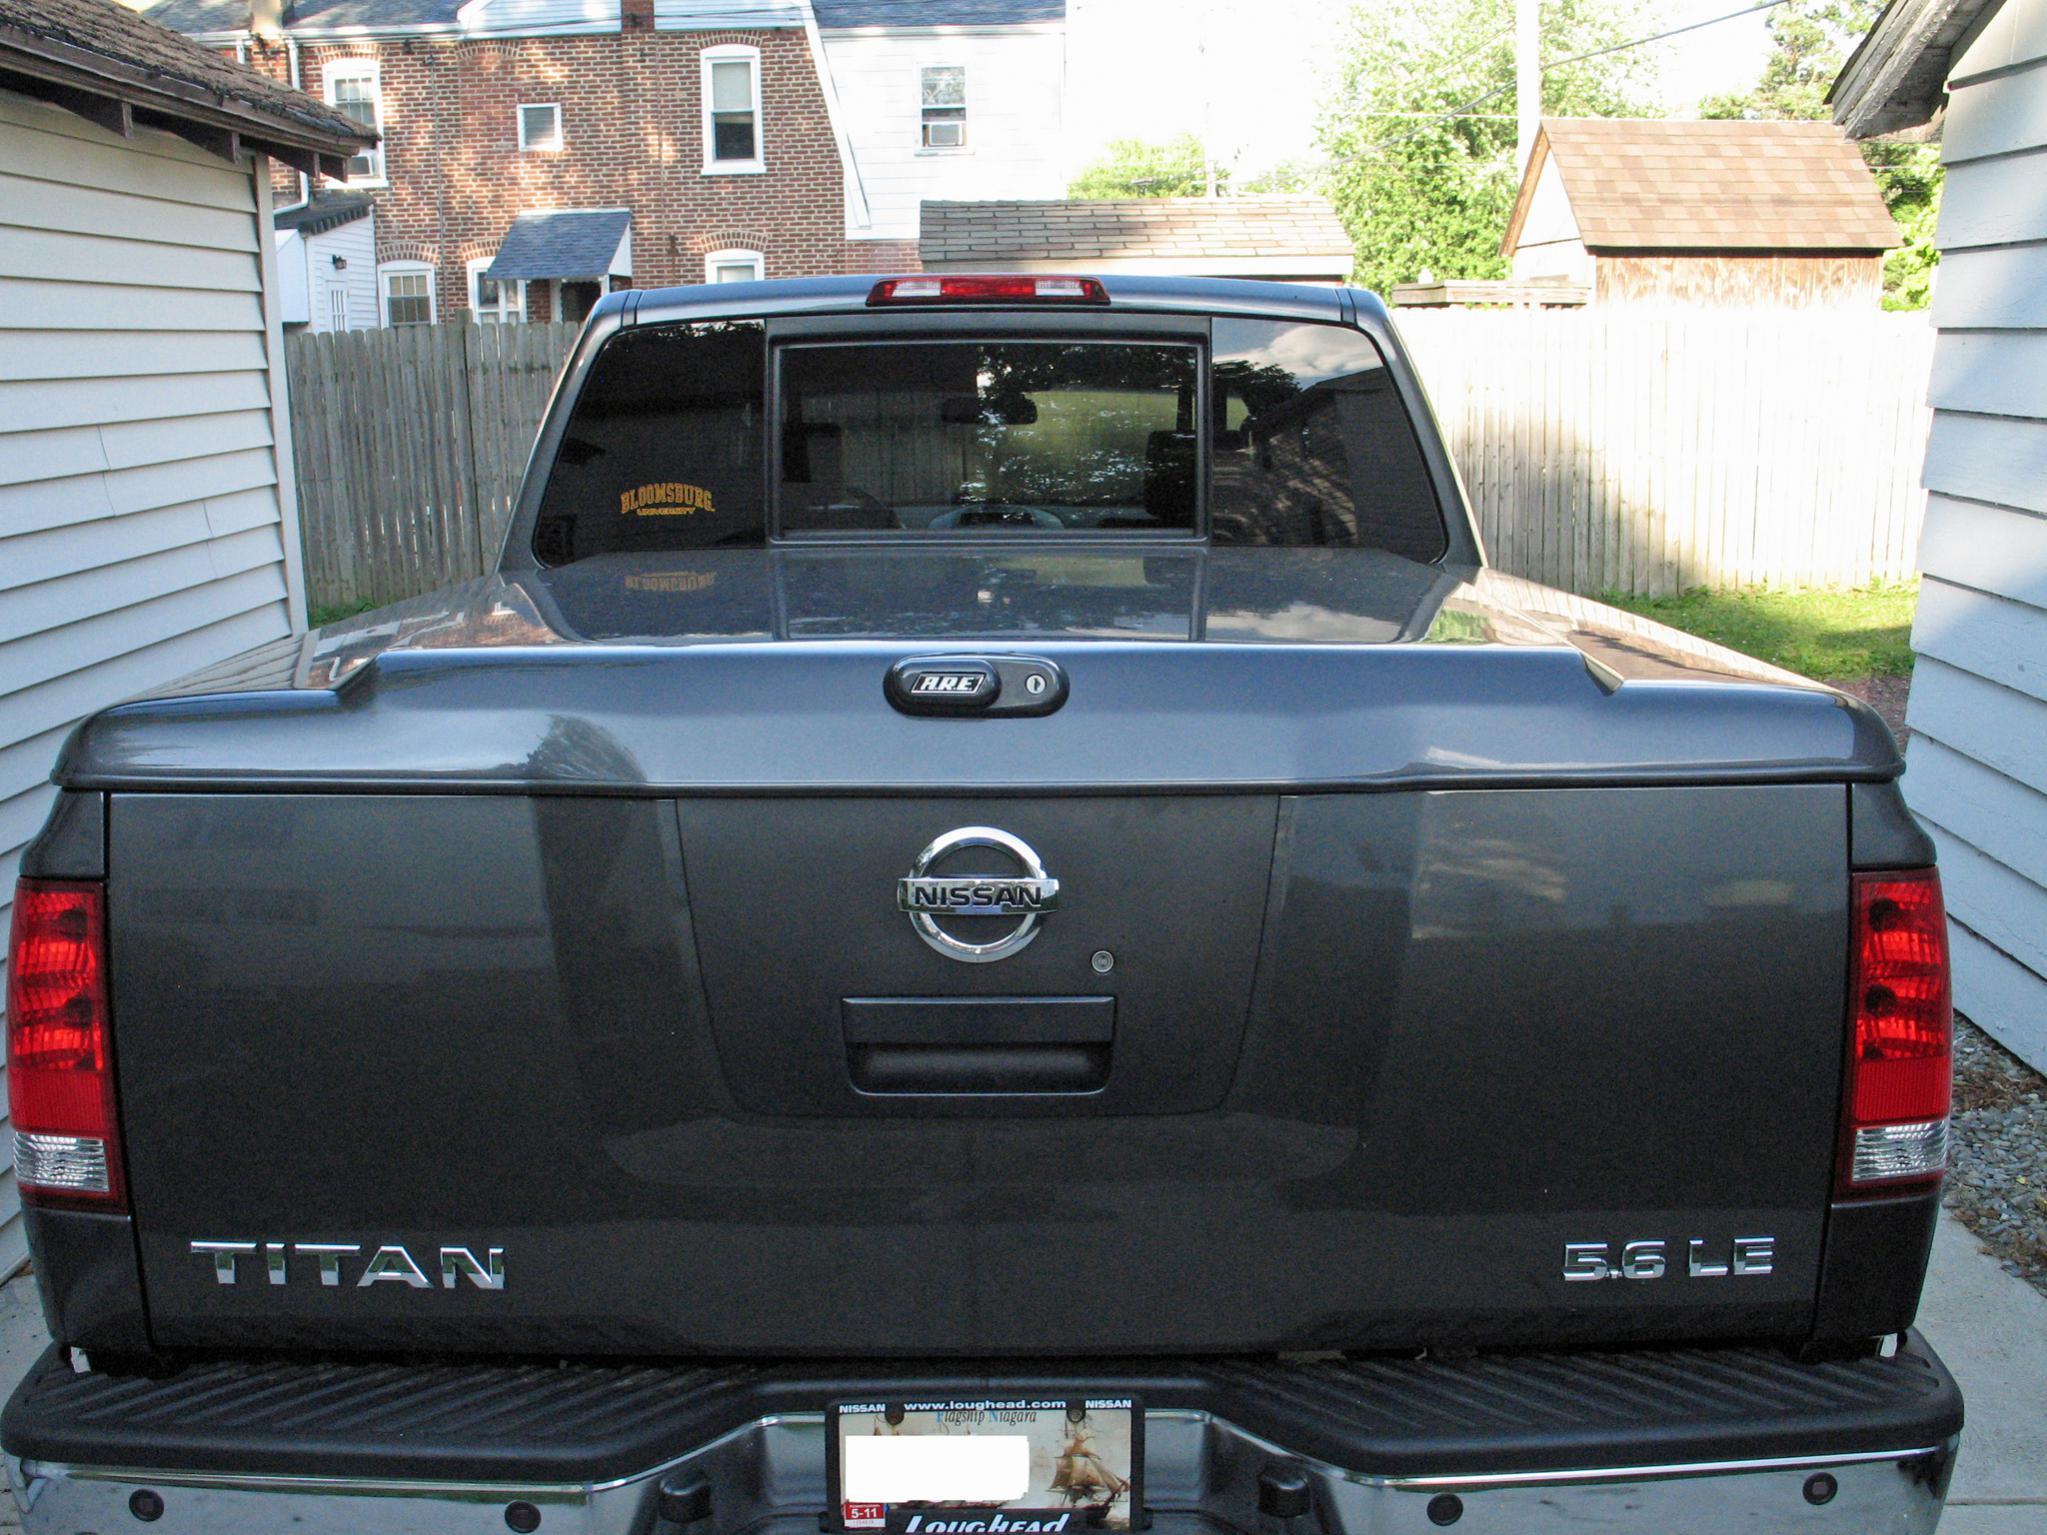 Fiberglass Tonneau Cover For Shortbed Titan   0 Tonneau Cover 2 ...